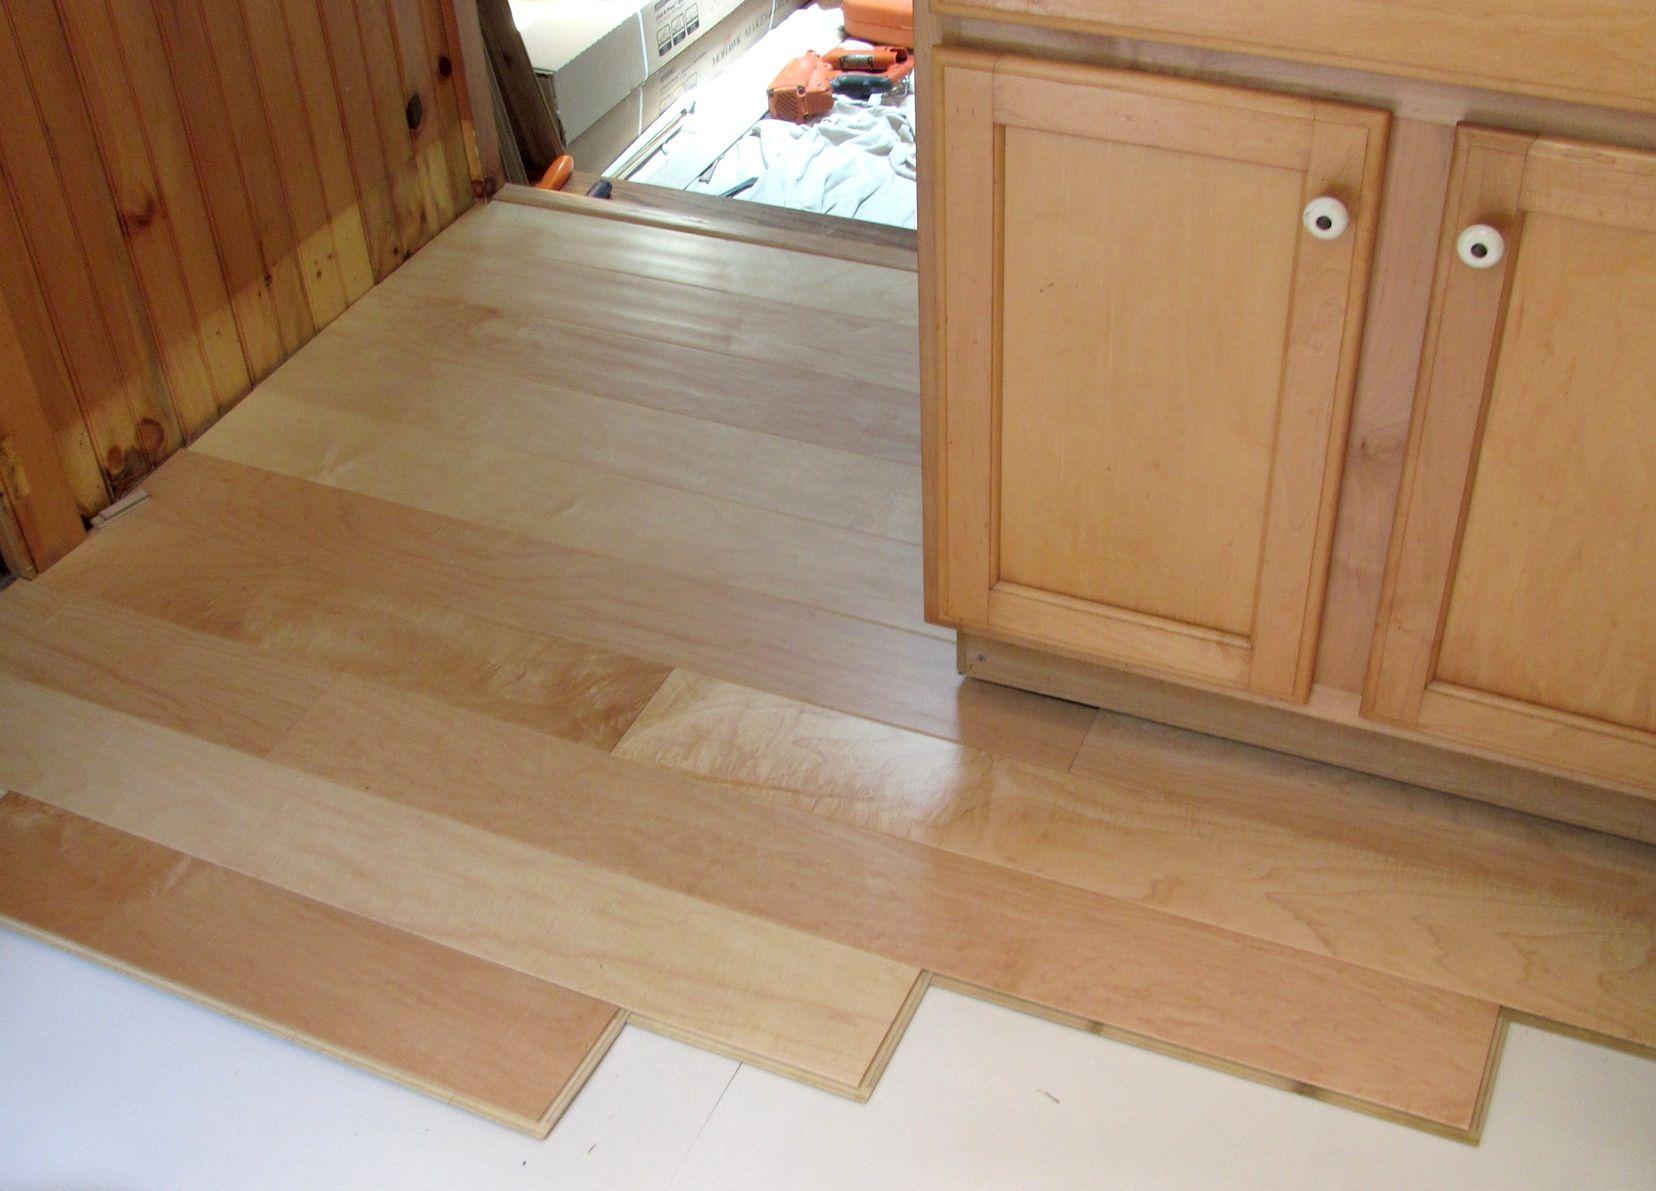 How To Lay A Laminate Floor Flooring Laminate Flooring Laminate